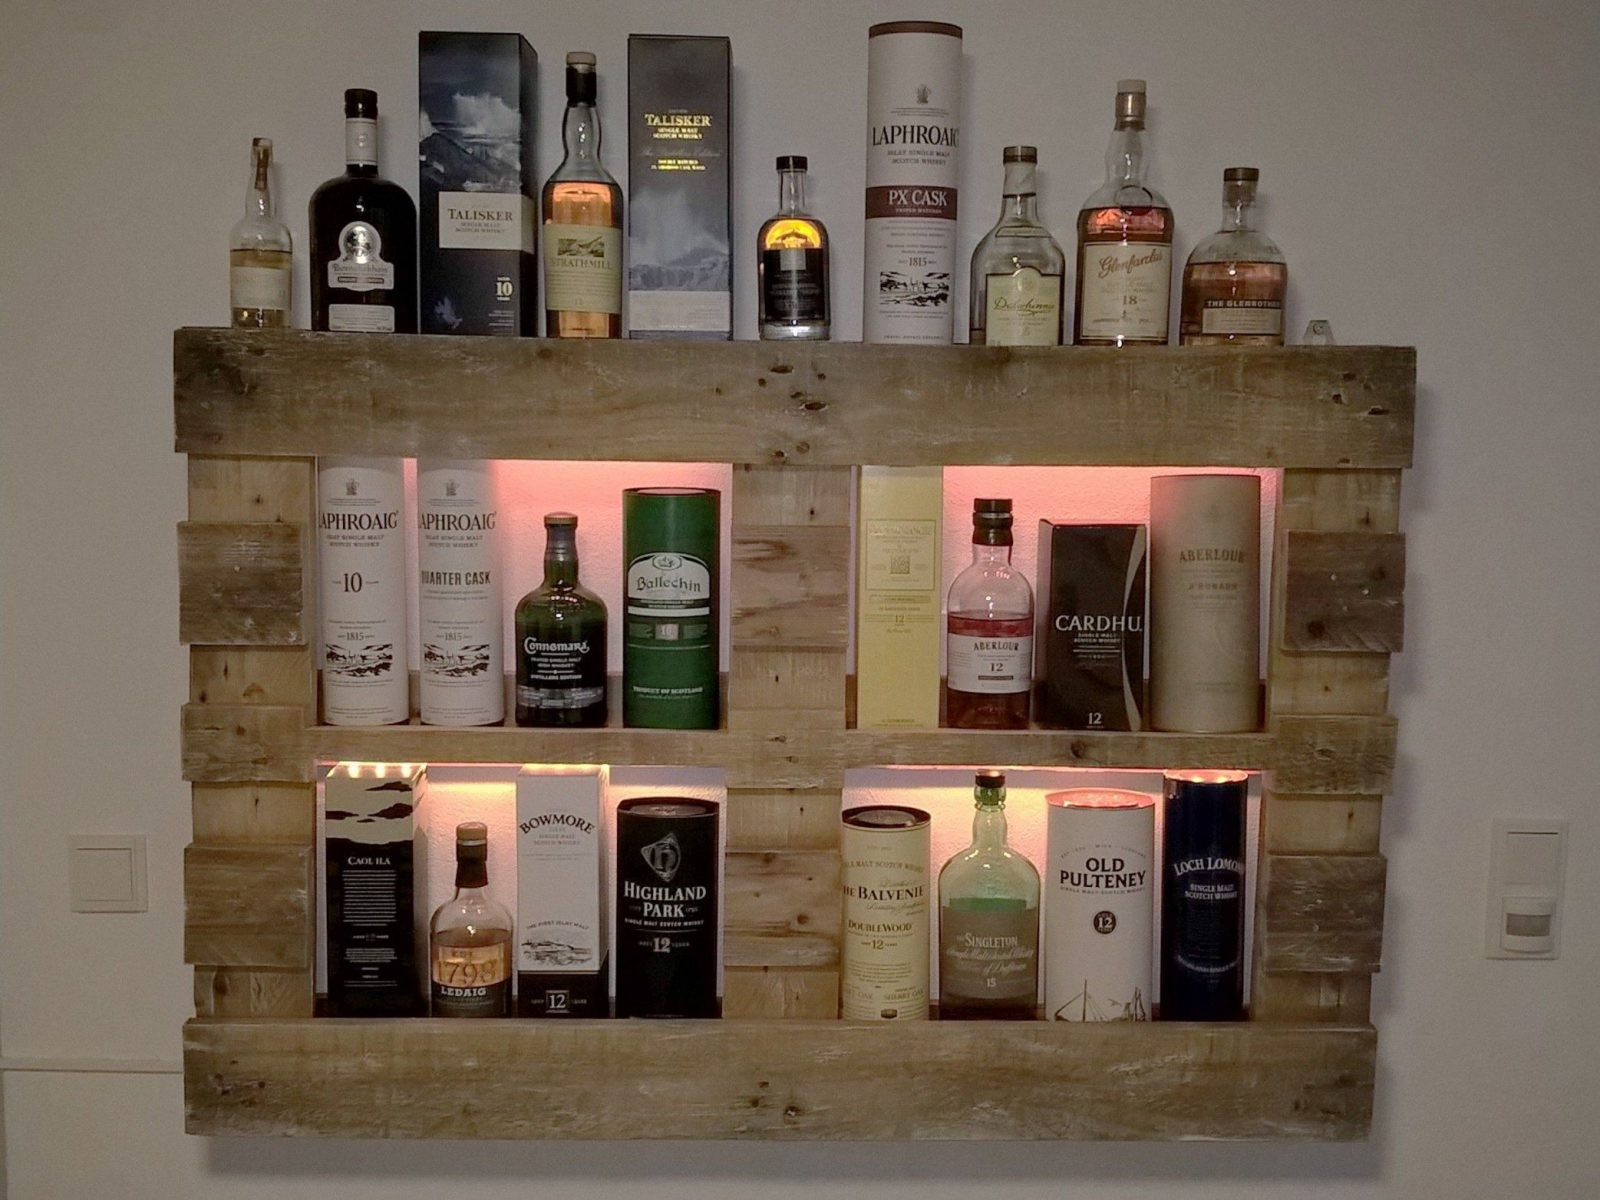 Regal Mit Led Beleuchtung Selber Bauen Mit Whiskyregal Whisky von Whisky Regal Selber Bauen Bild